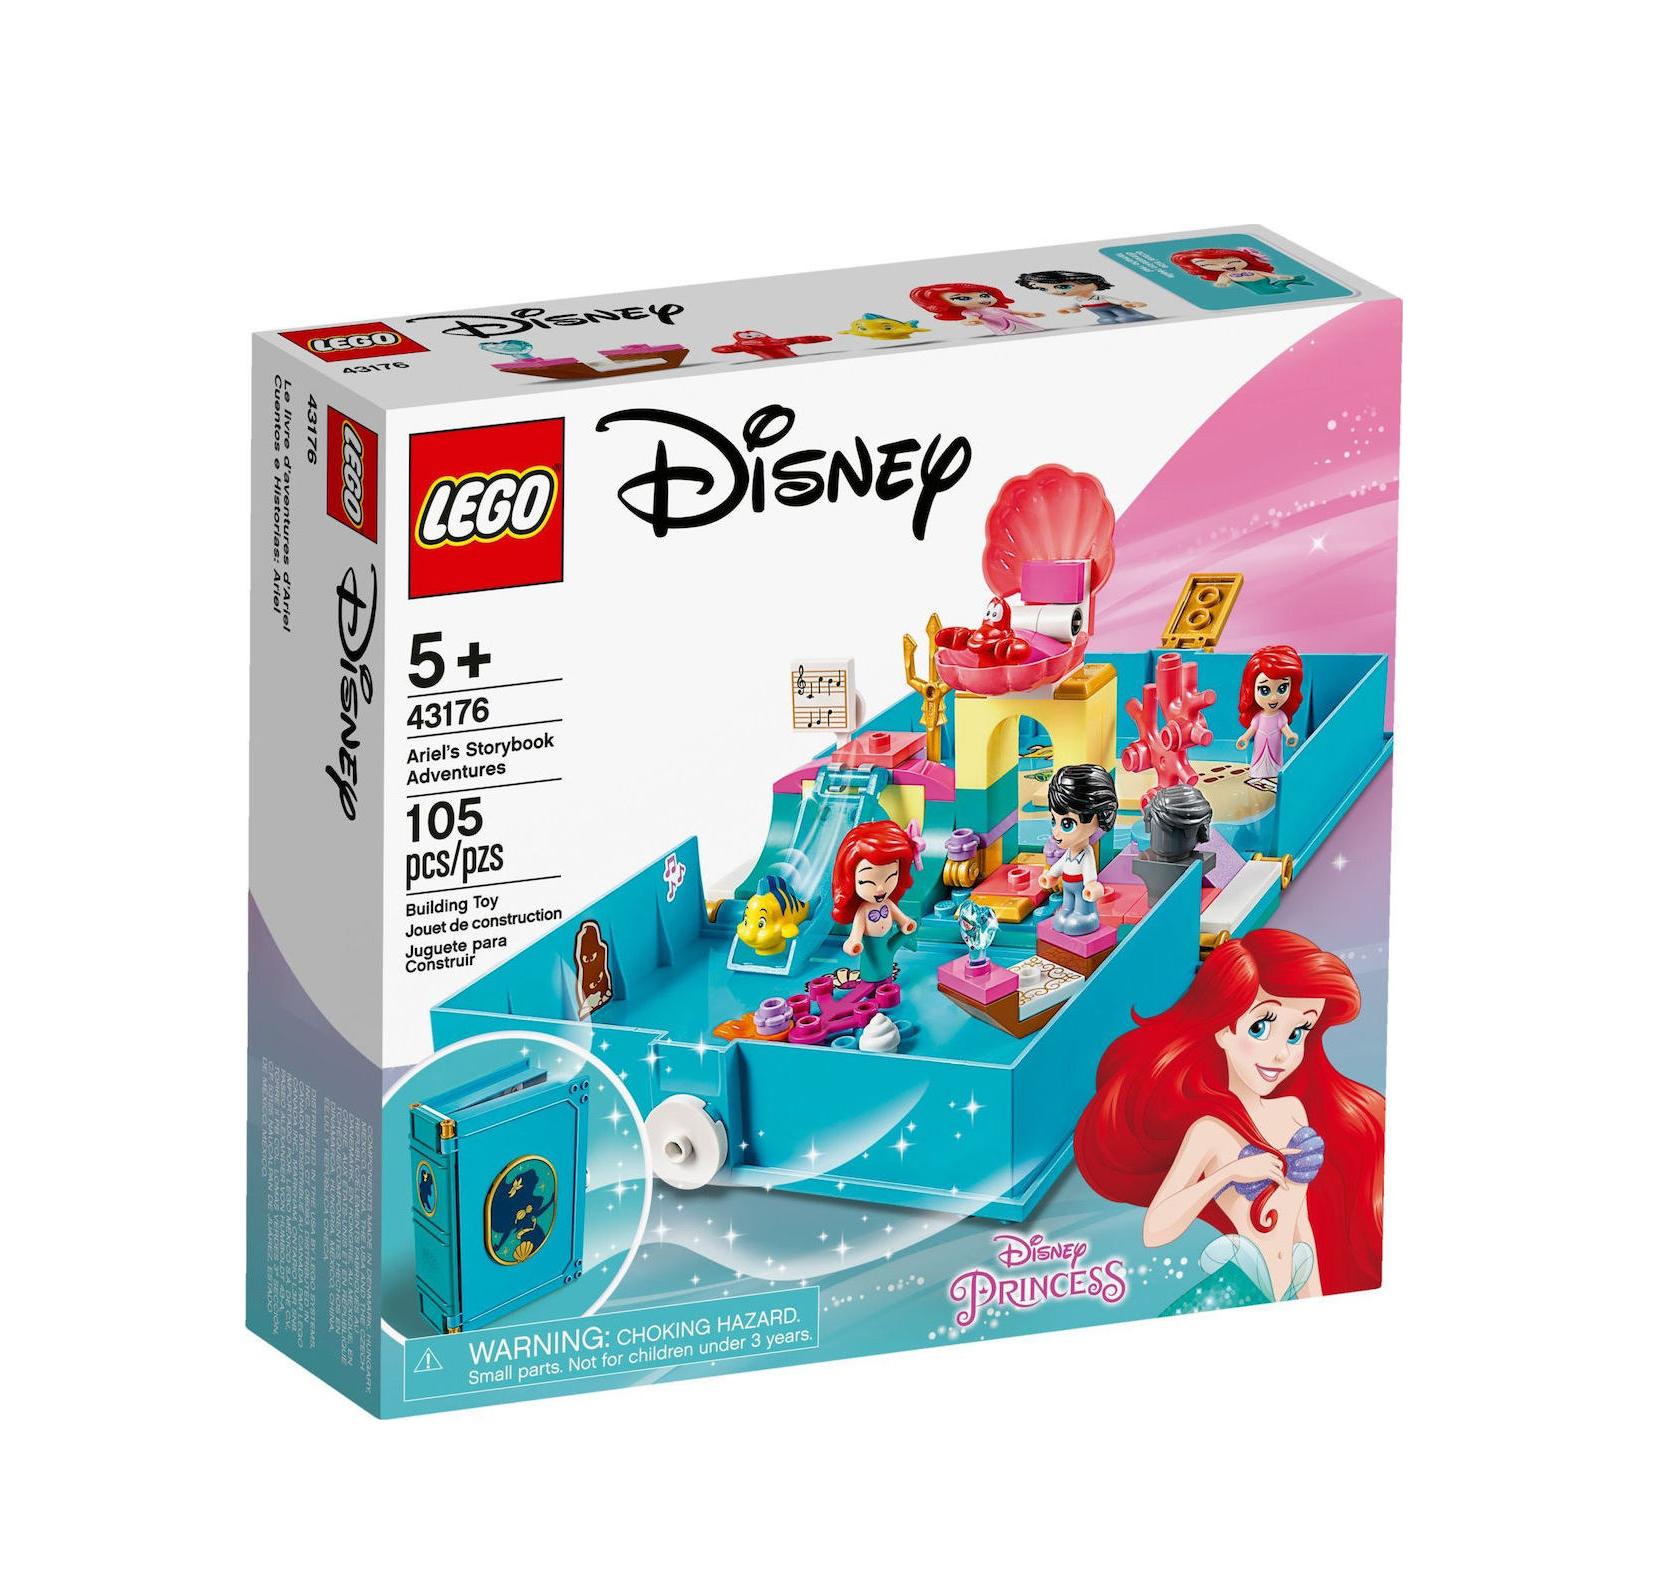 Lego Disney: Ariel's Storybook Adventures 43176